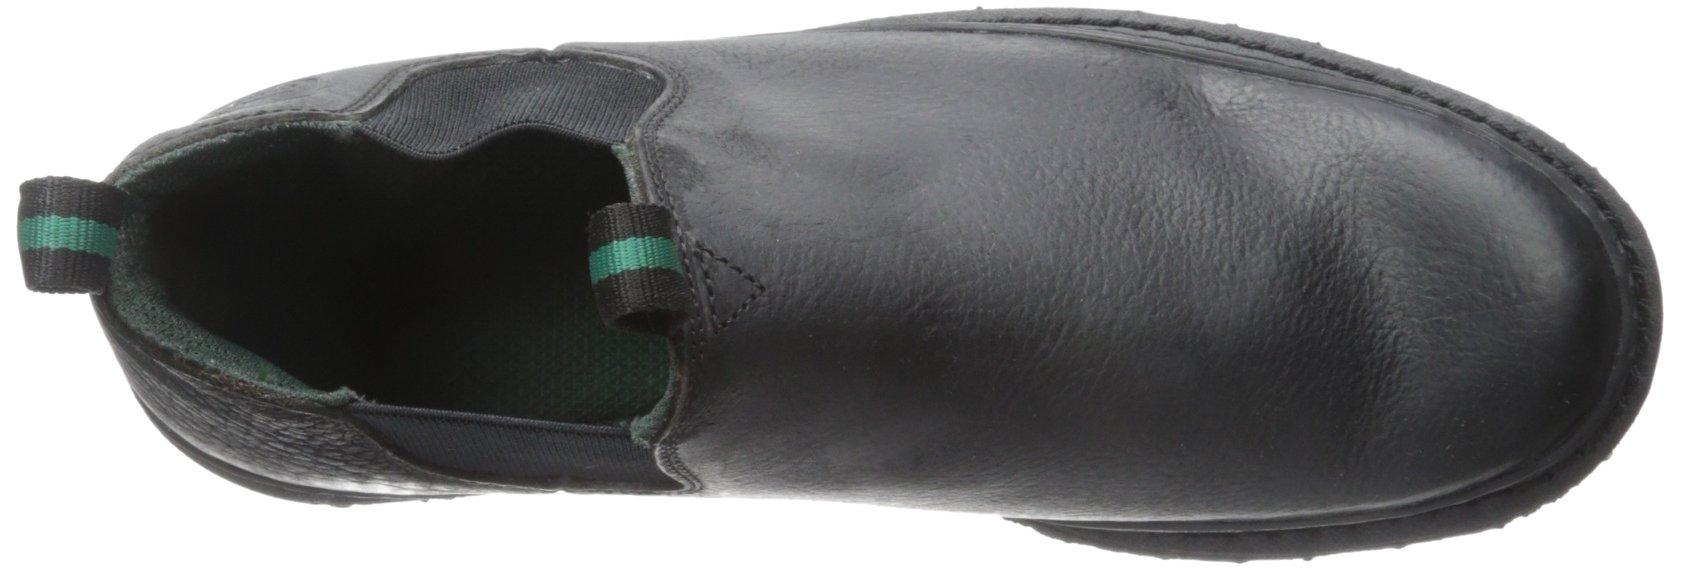 Georgia Boot Men's Twin Gore Romeo GR270 Work Boot,Black,6.5 M US by Georgia (Image #8)